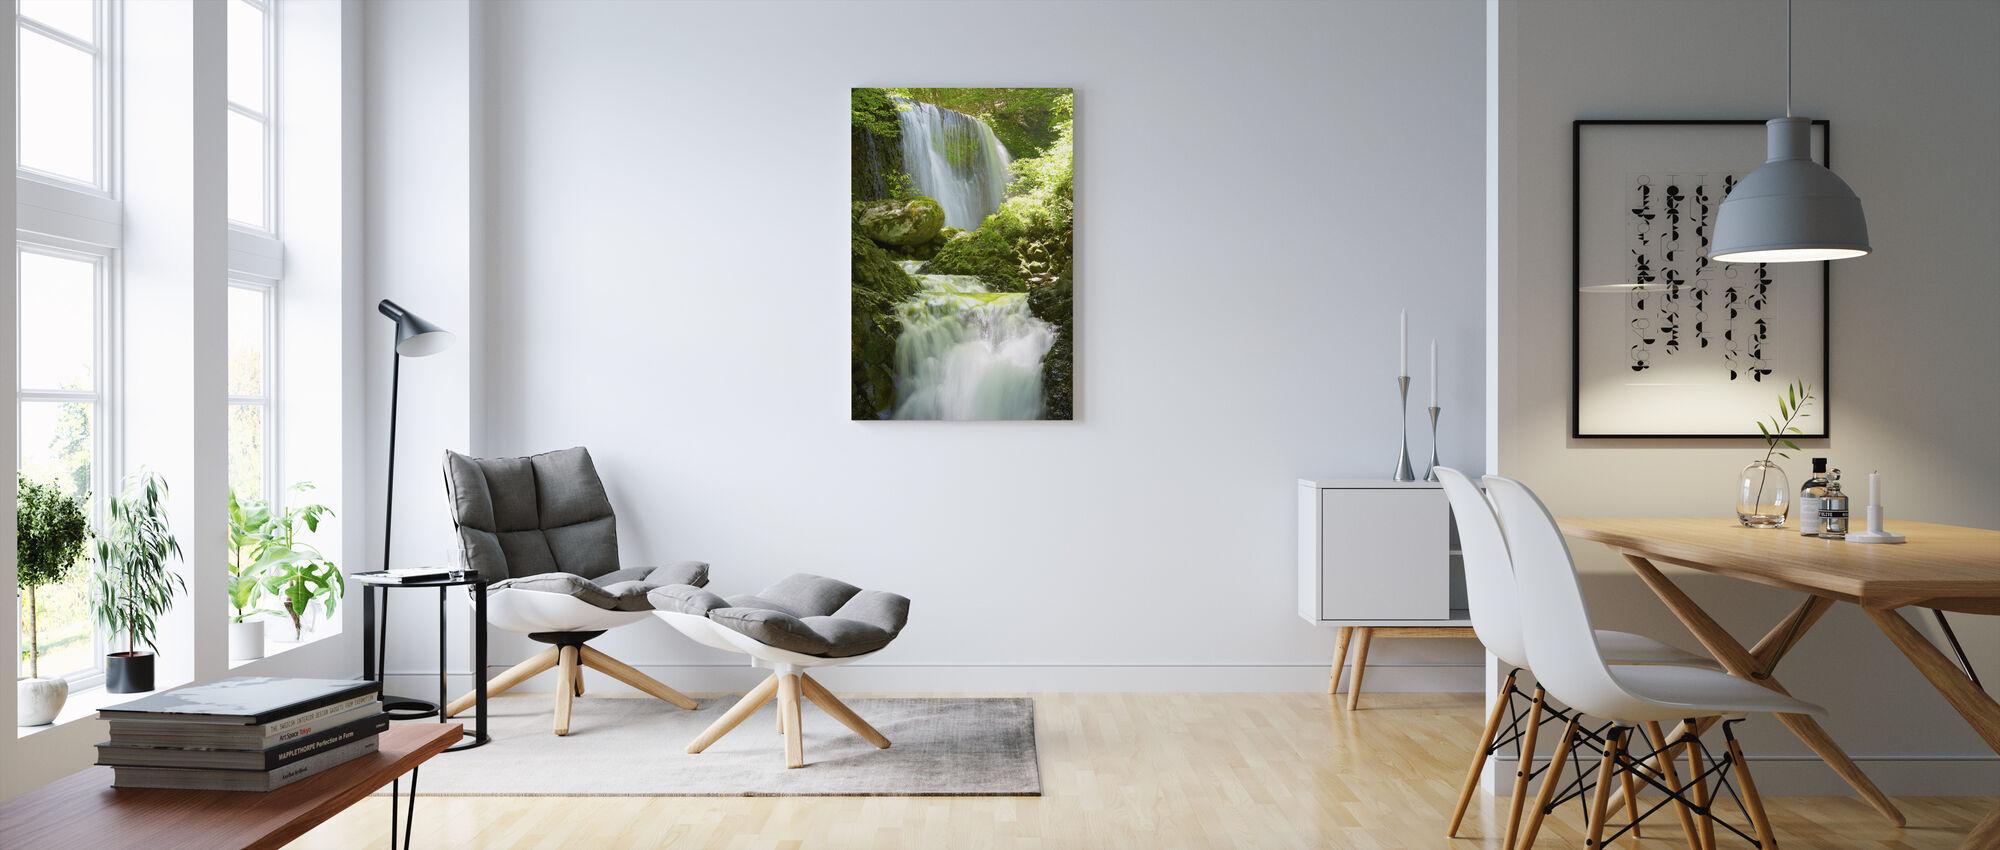 Koromonotaki Falls - Canvastavla - Vardagsrum